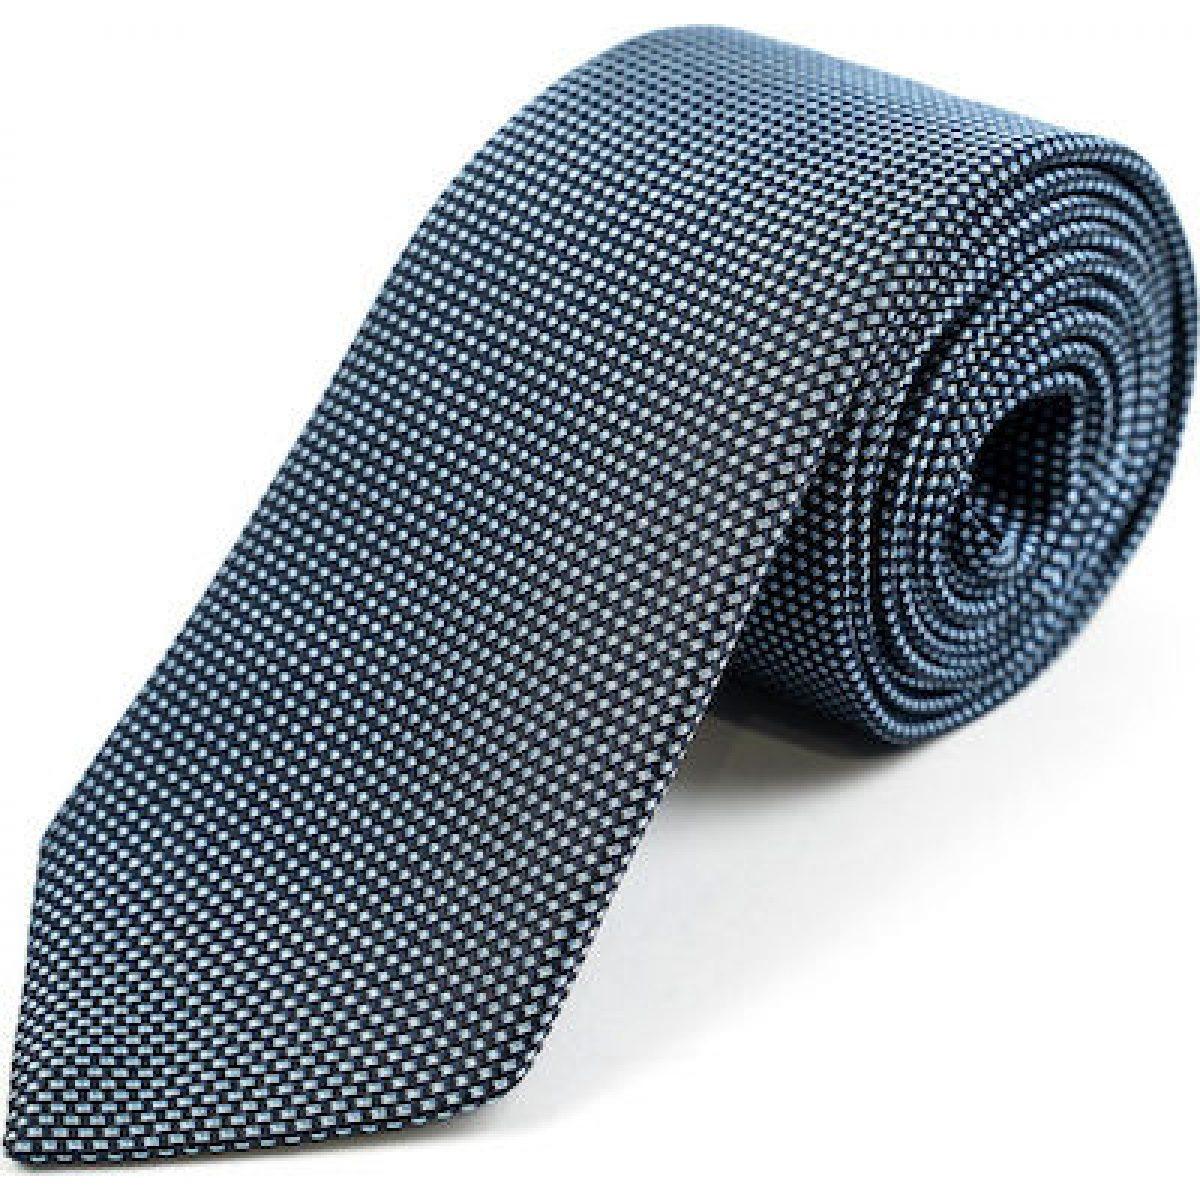 xlarge 20210913102420 hugo boss andriki gravata me schedia se navy mple chroma 50458530 405